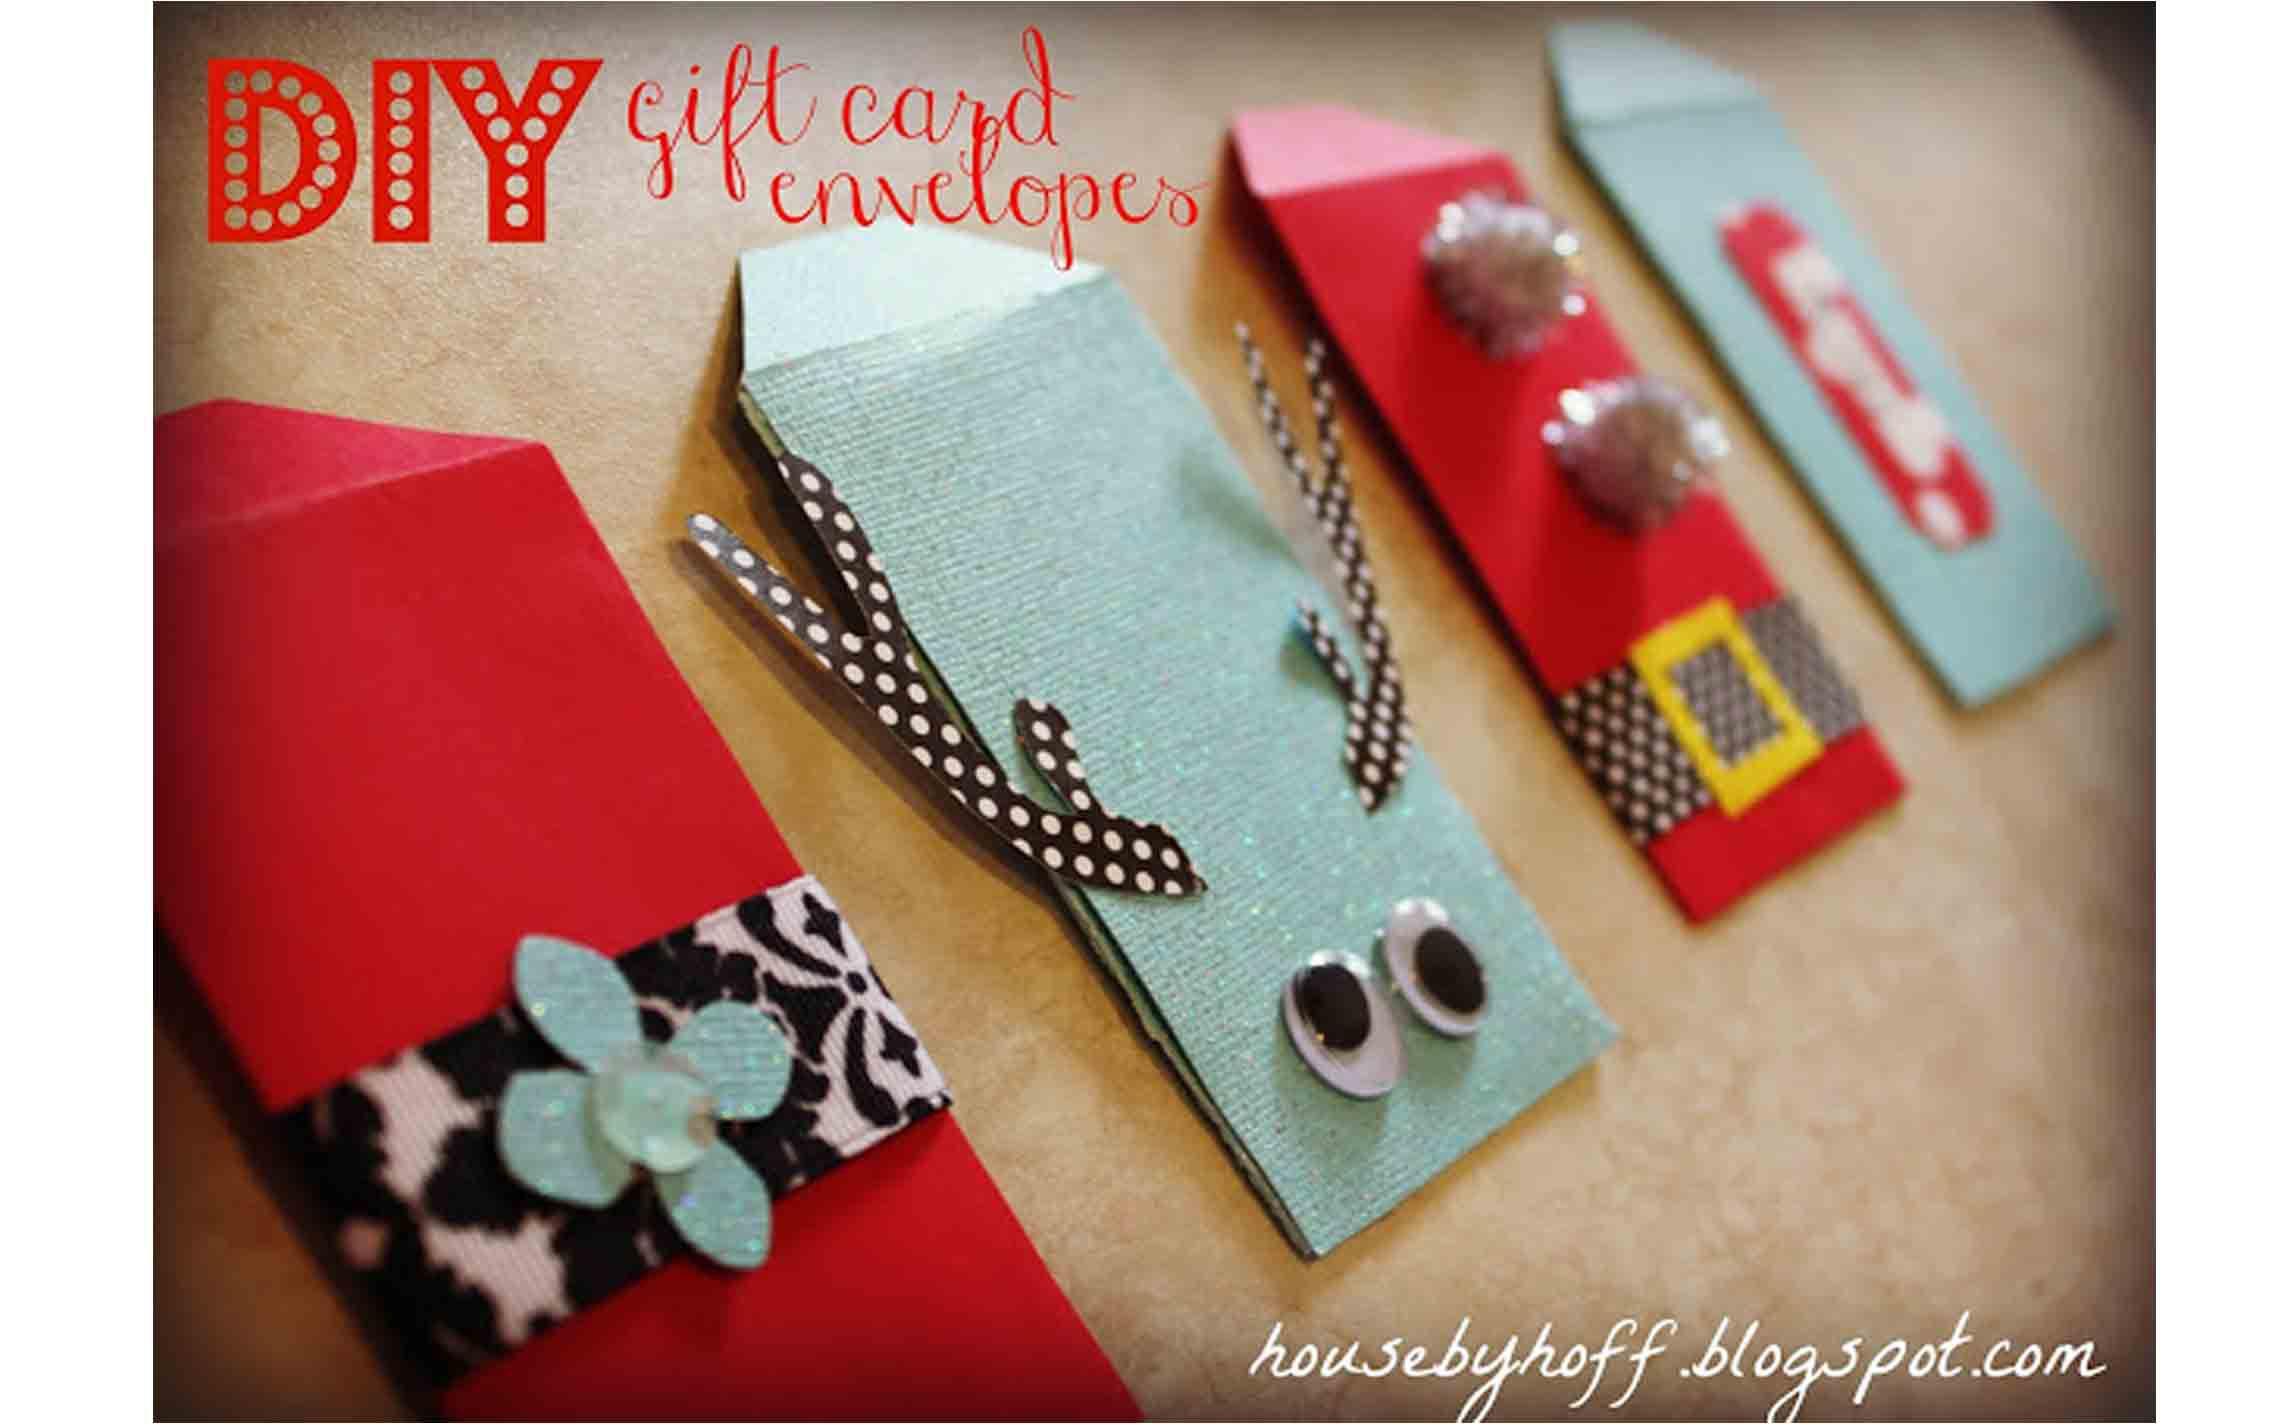 002 Shocking Gift Card Envelope Template Inspiration  Templates Voucher Diy Free PrintableFull